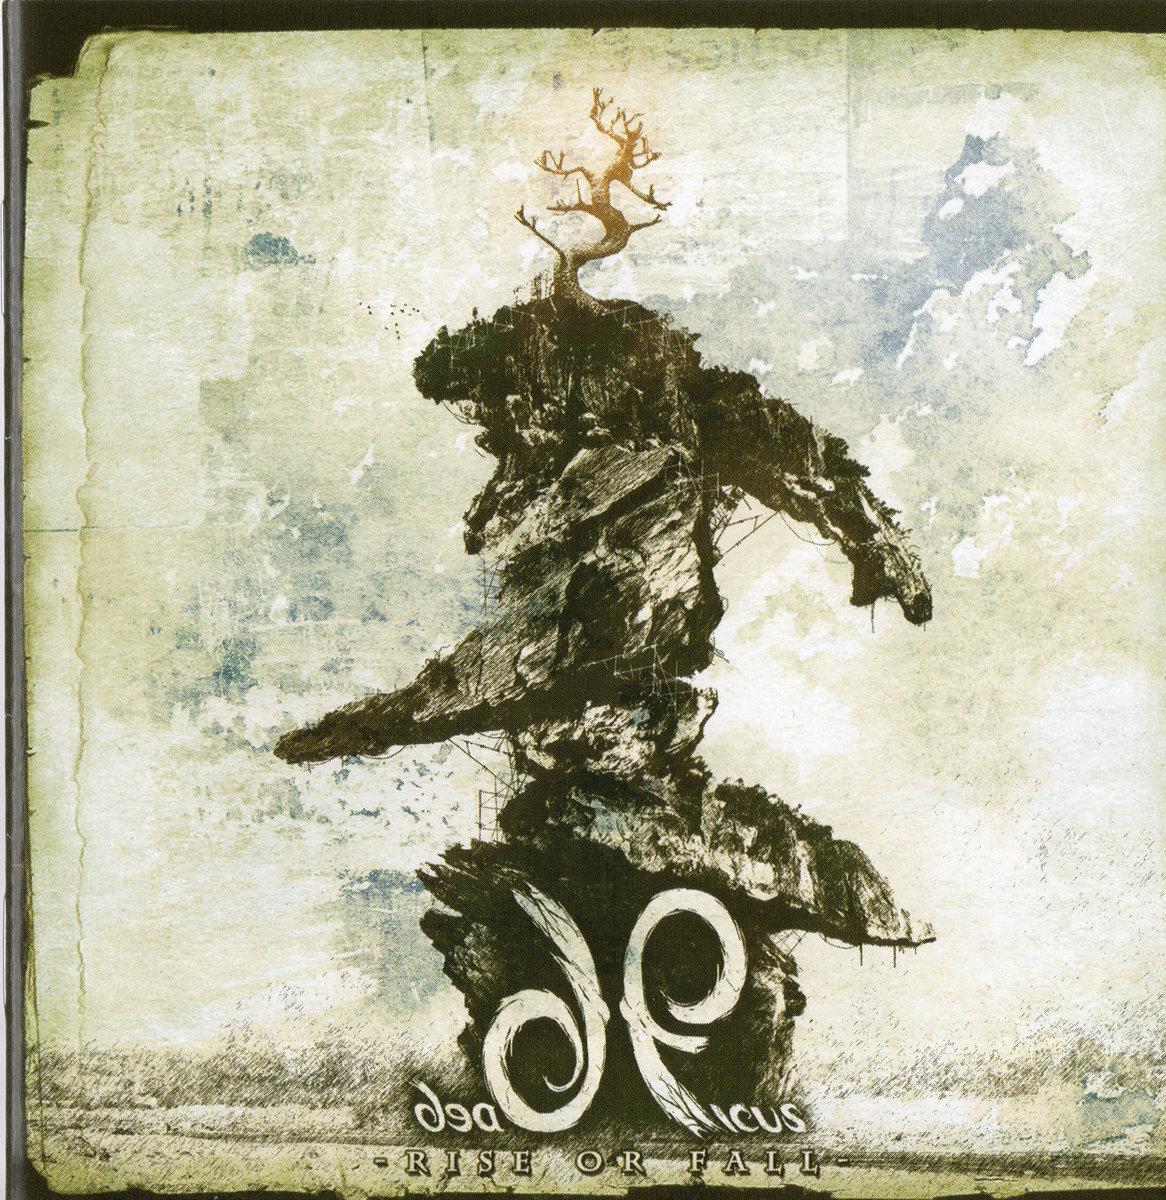 Dead Ficus –Rise Or Fall 4/6